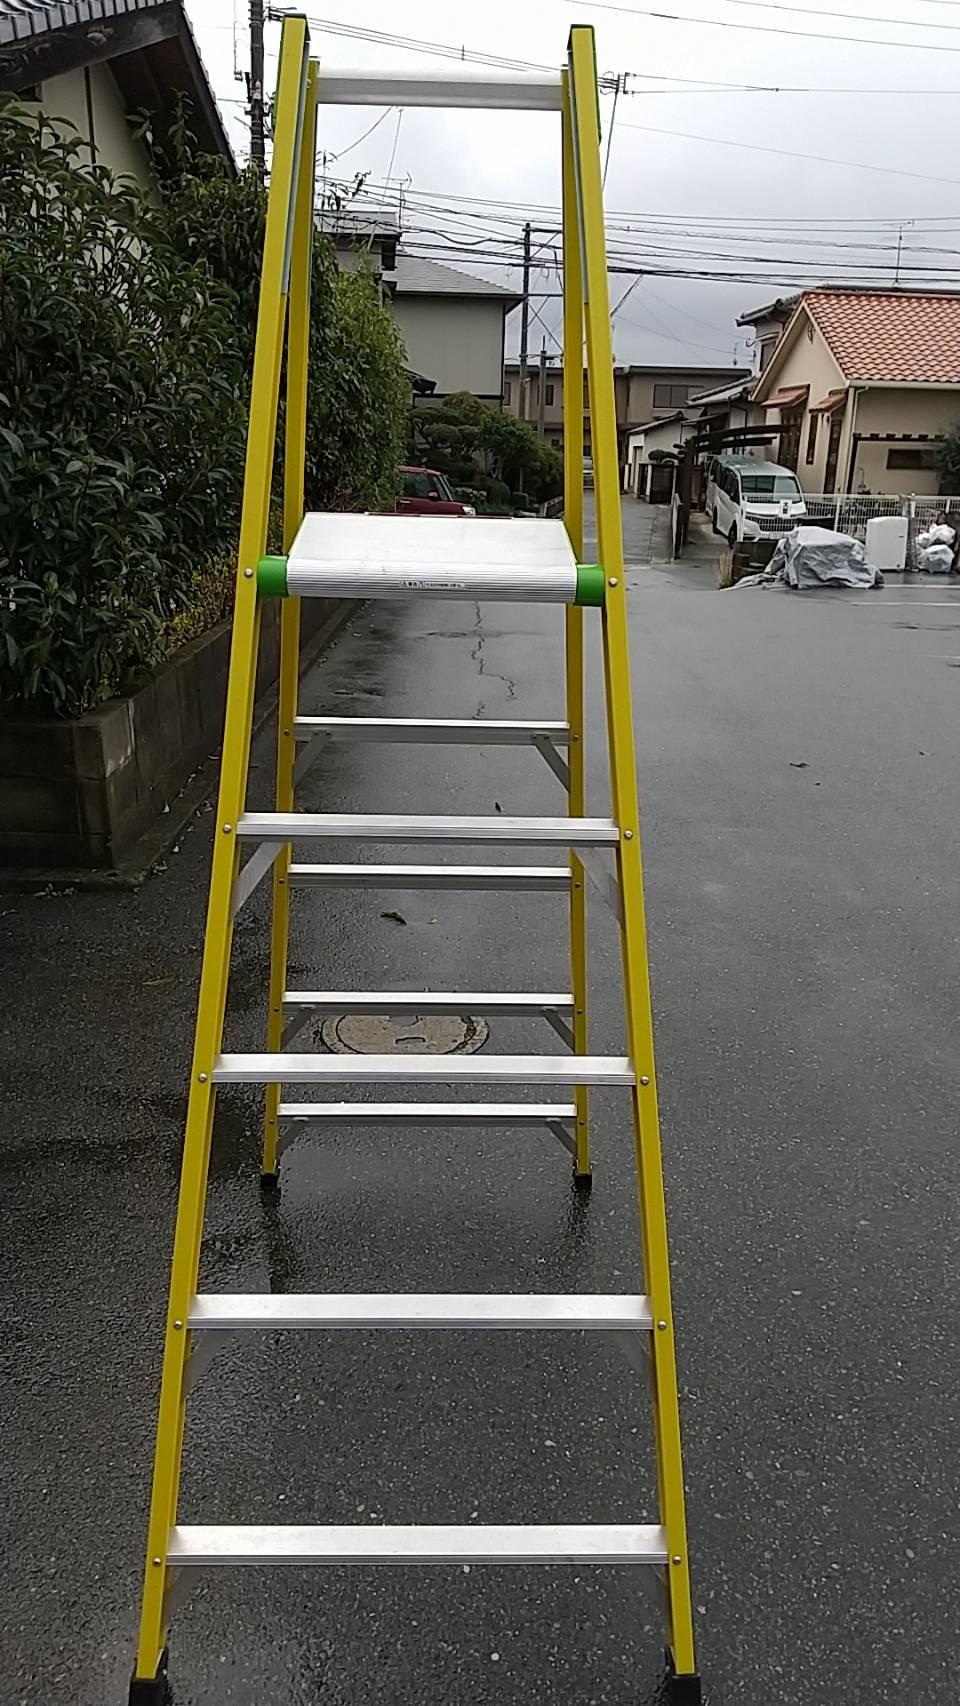 【Hasegawa(長谷川) 電工事専用脚立  オーダーメイド 最大質量100kg】を買取致しました!!の買取-